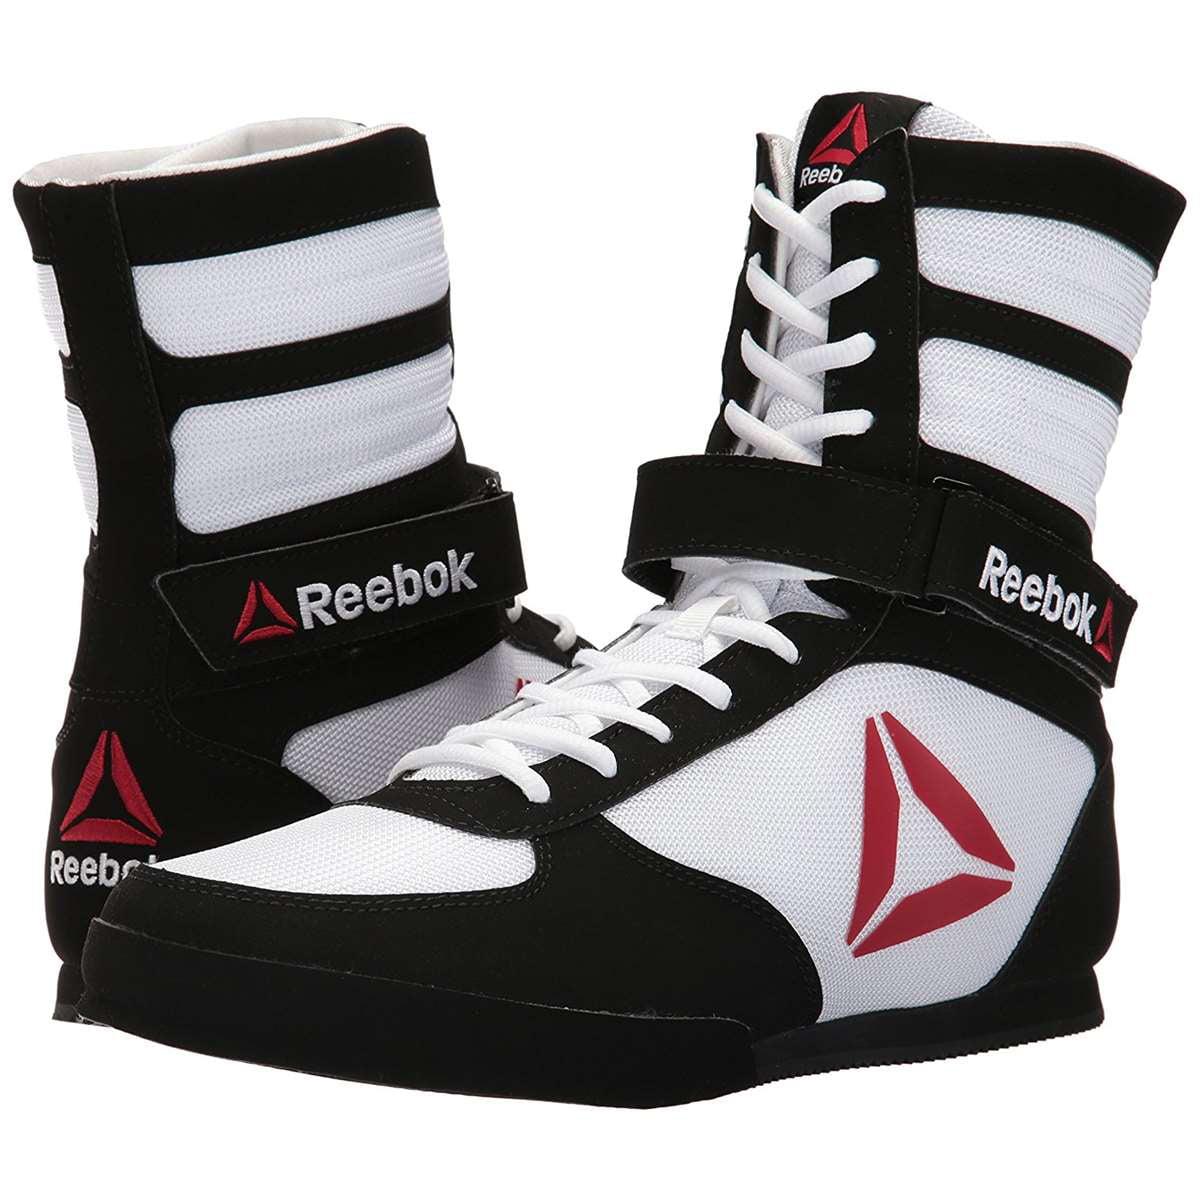 Reebok Boxing Boot Buck Shoes Mens by Reebok